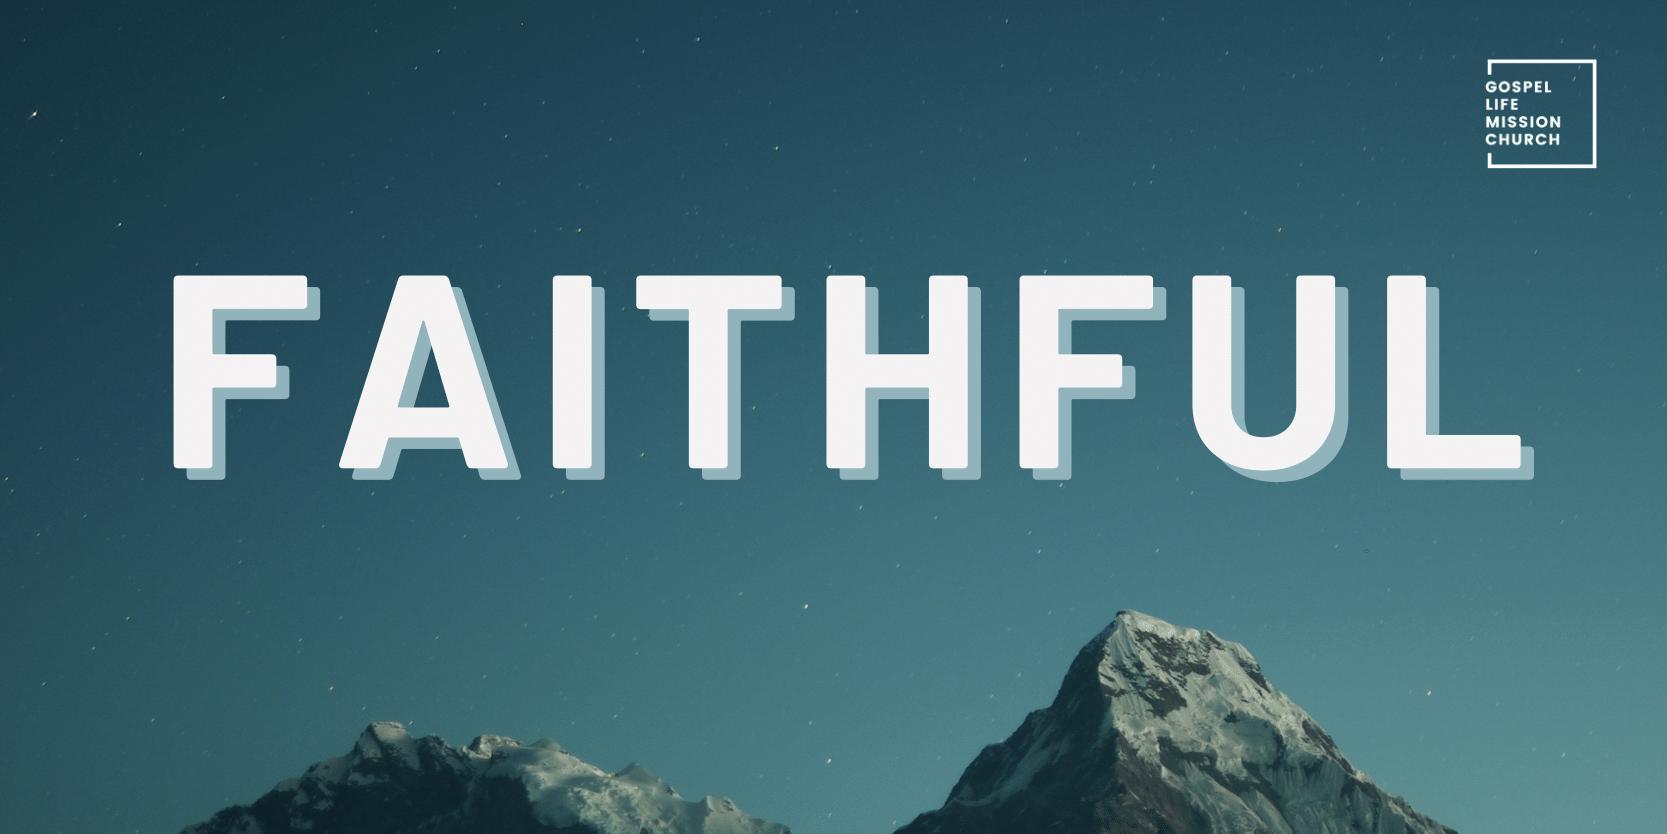 Faithful-1.png